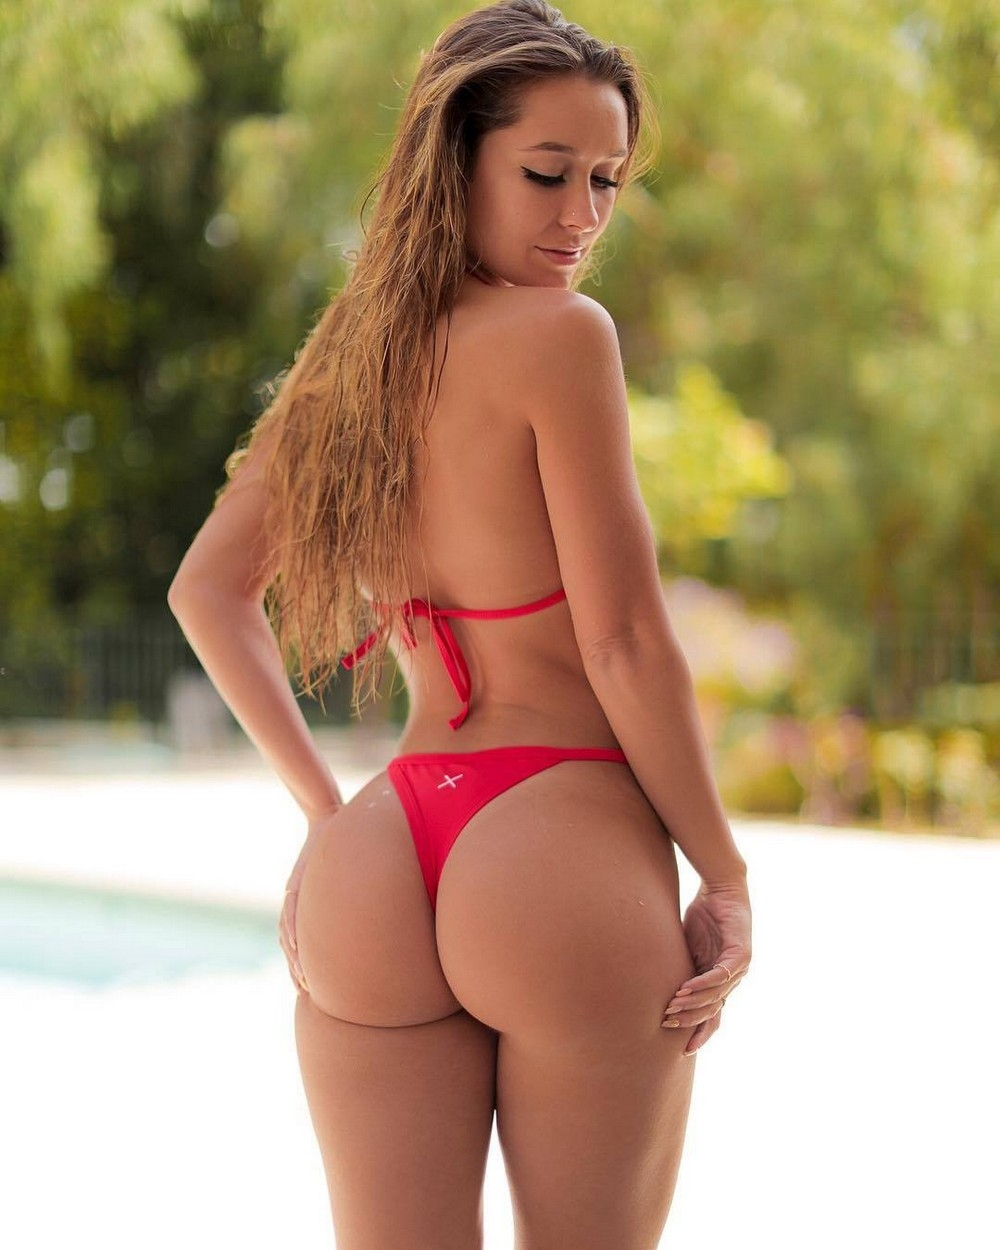 Boobs Thongs Pics And Huge Tits Porn